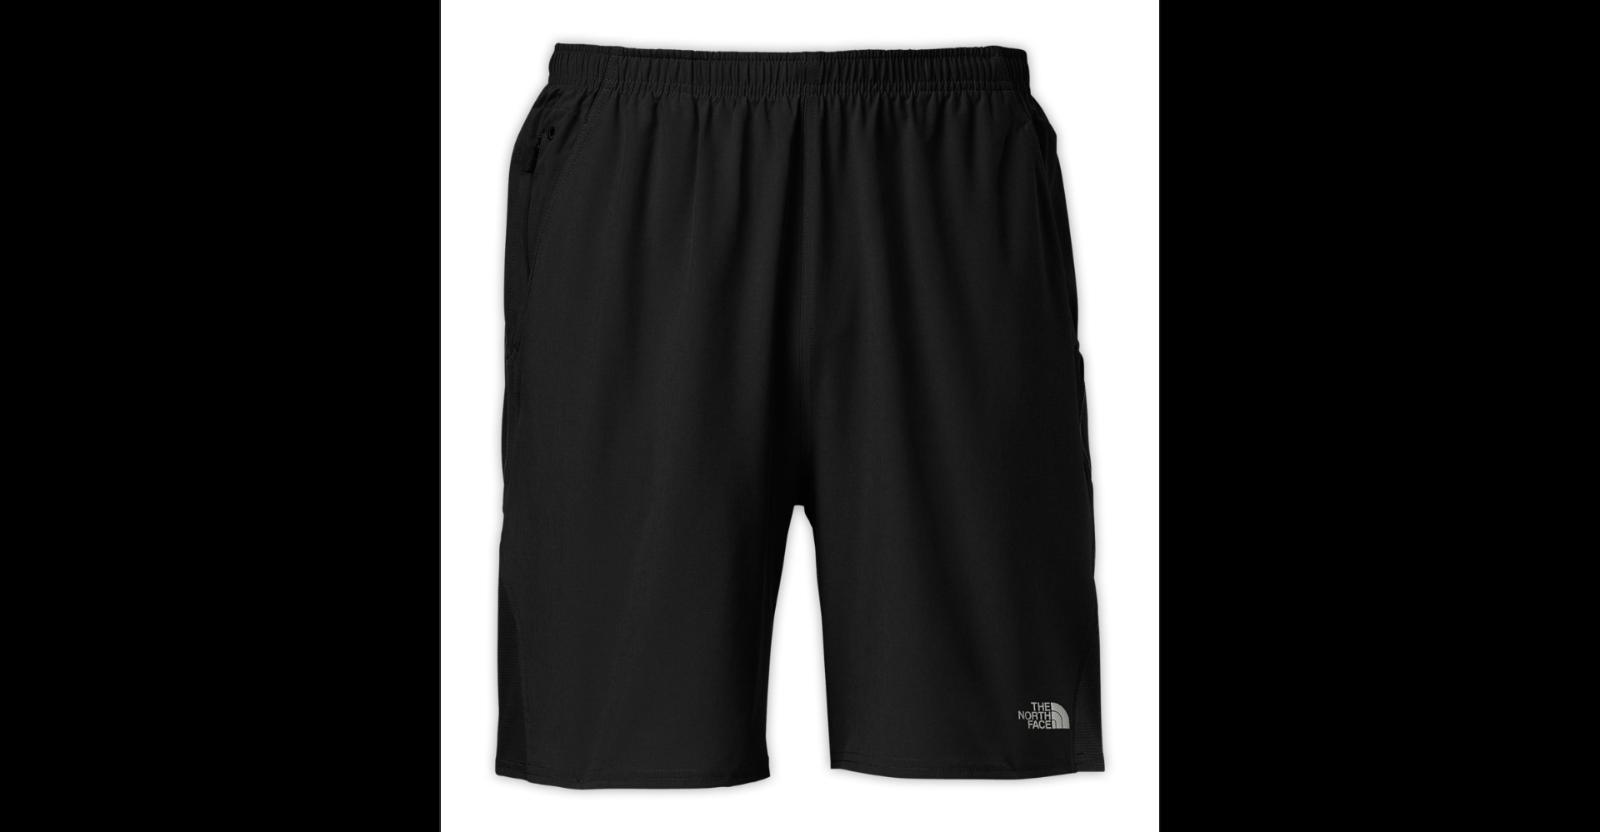 THE North Face uomo AGILITY 7  Pantaloncini Corsa Palestra X-fit Short Tnf Nero XXL 2XL